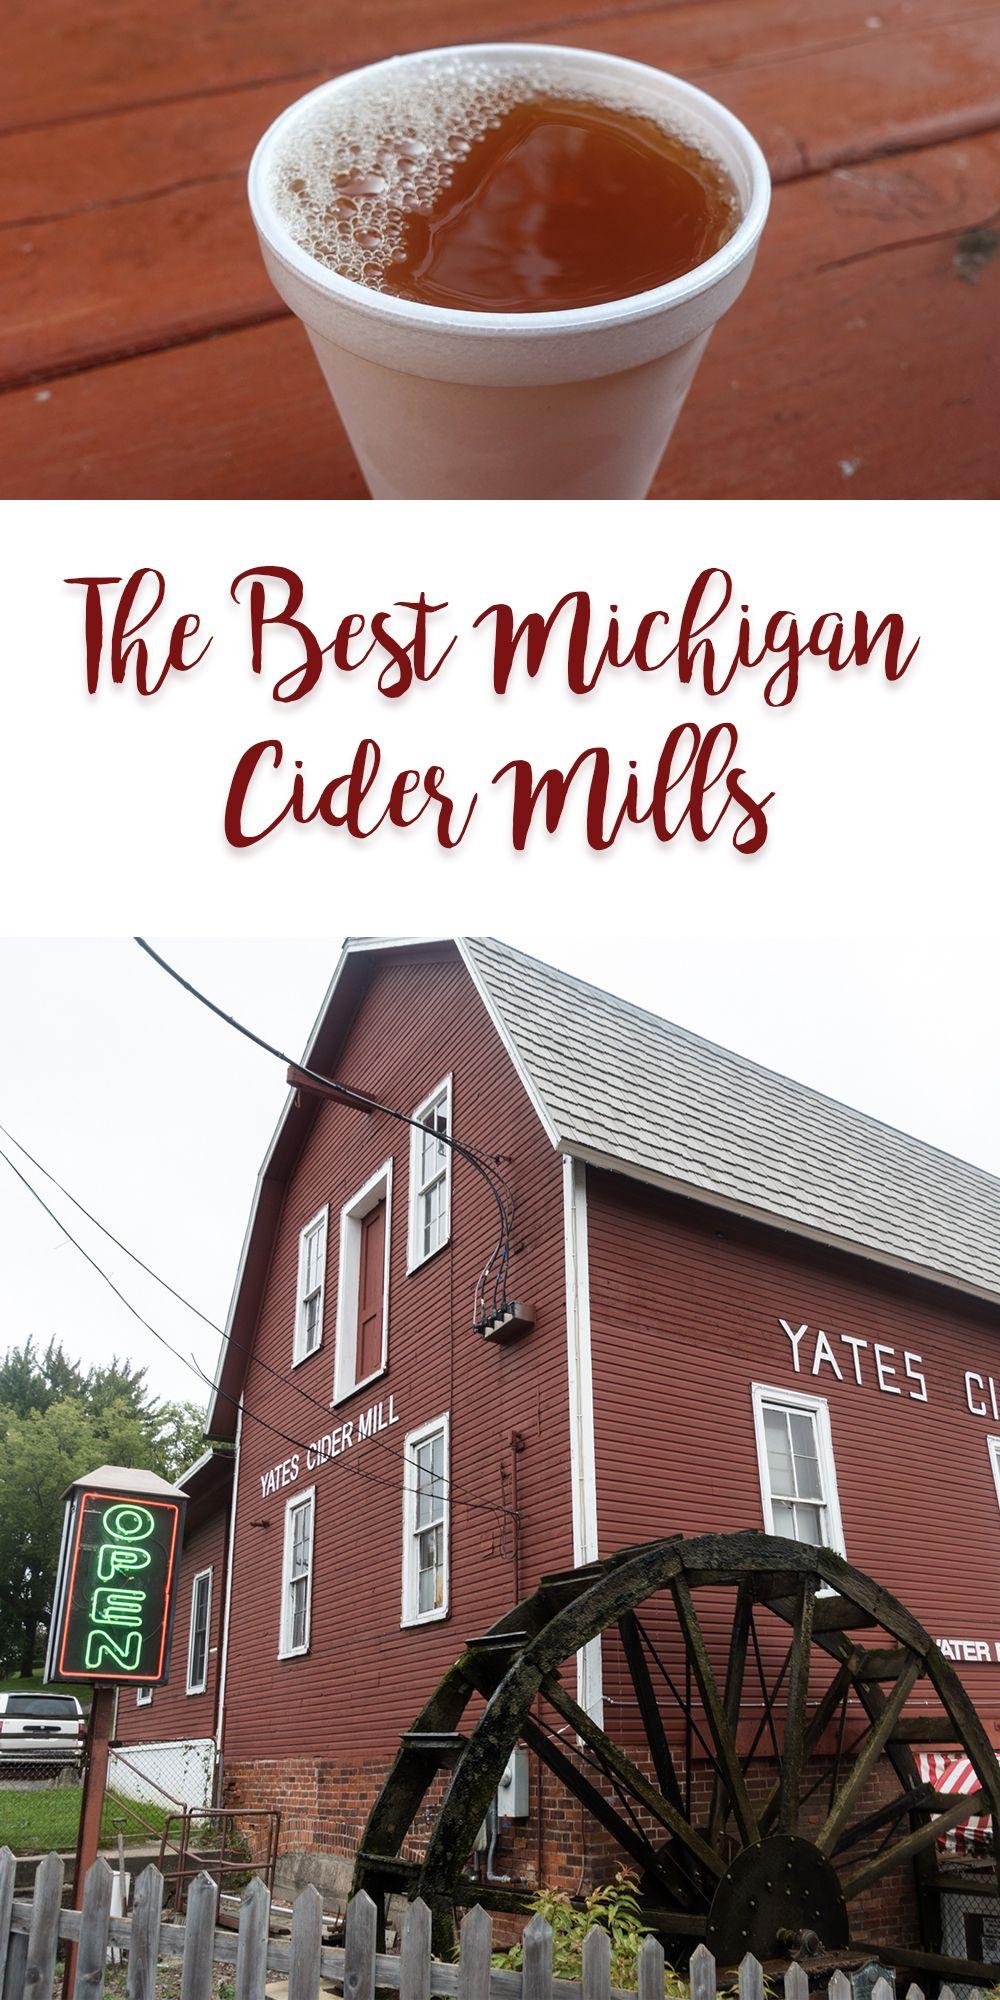 The Best Michigan Cider Mills - Thyme & Love